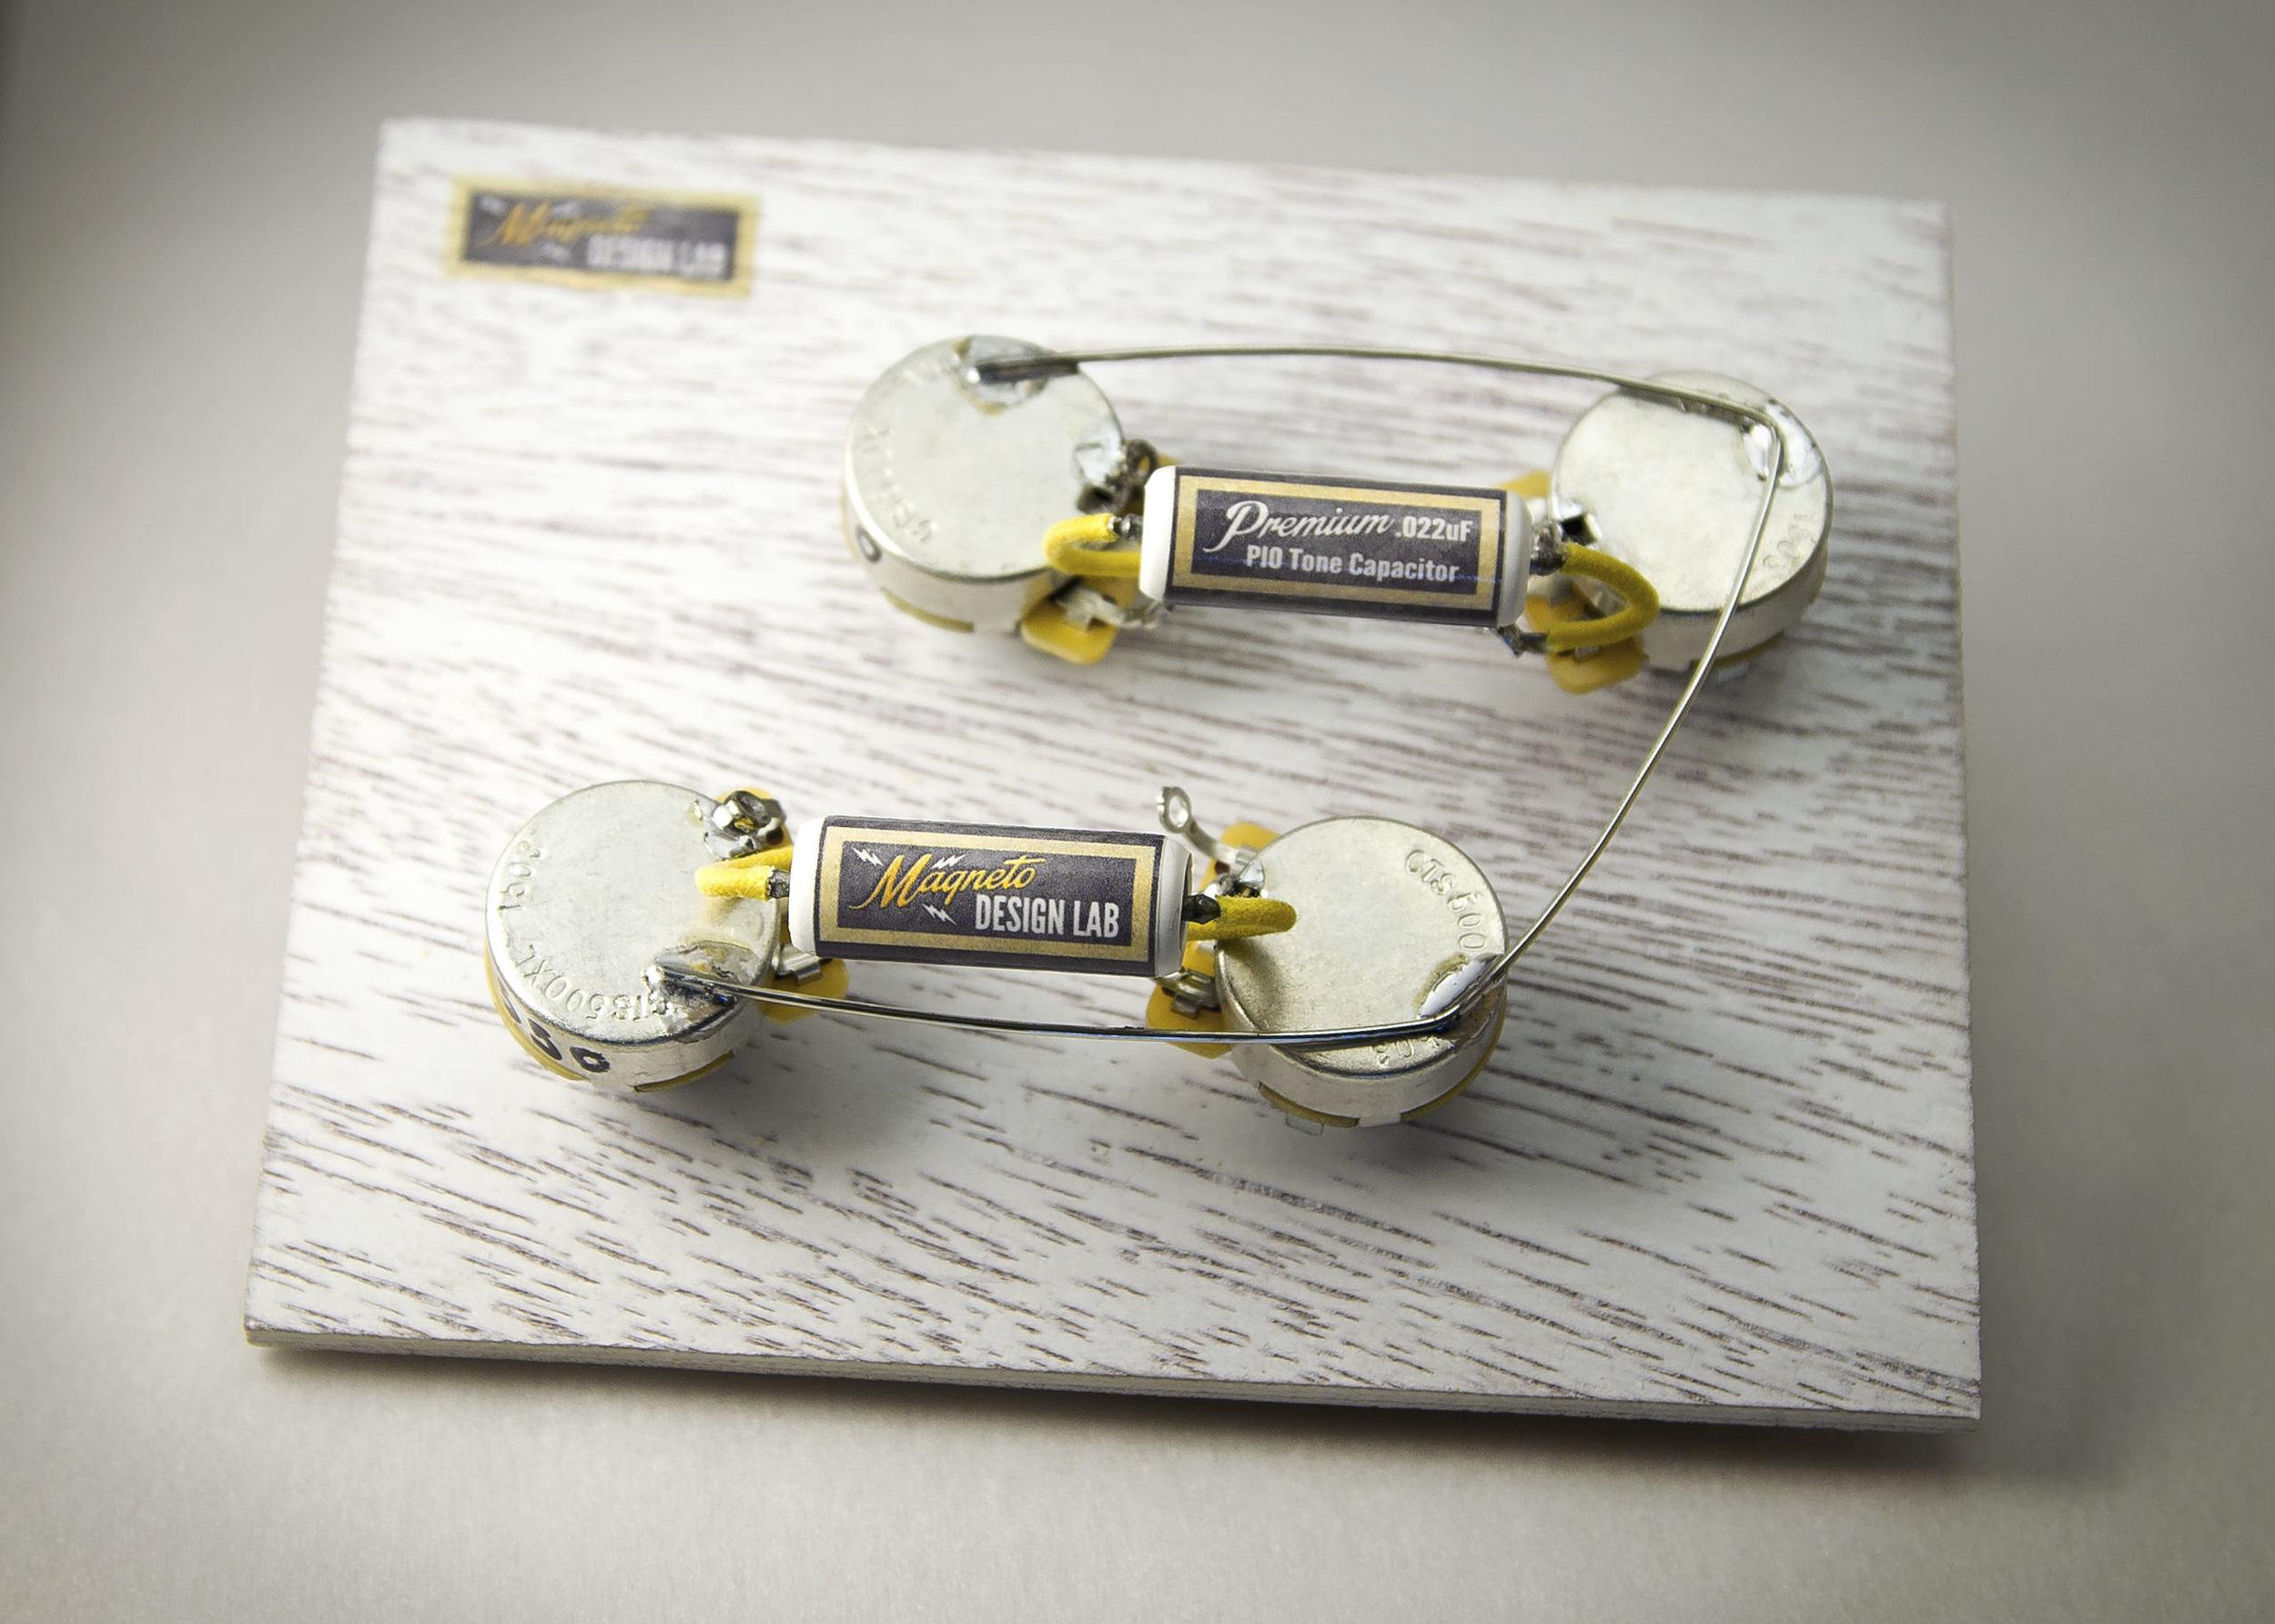 Les+Paul+Wiring beauty+shot+4 MG_1263?format=1500w paul wiring harness wiring harness les paul at aneh.co